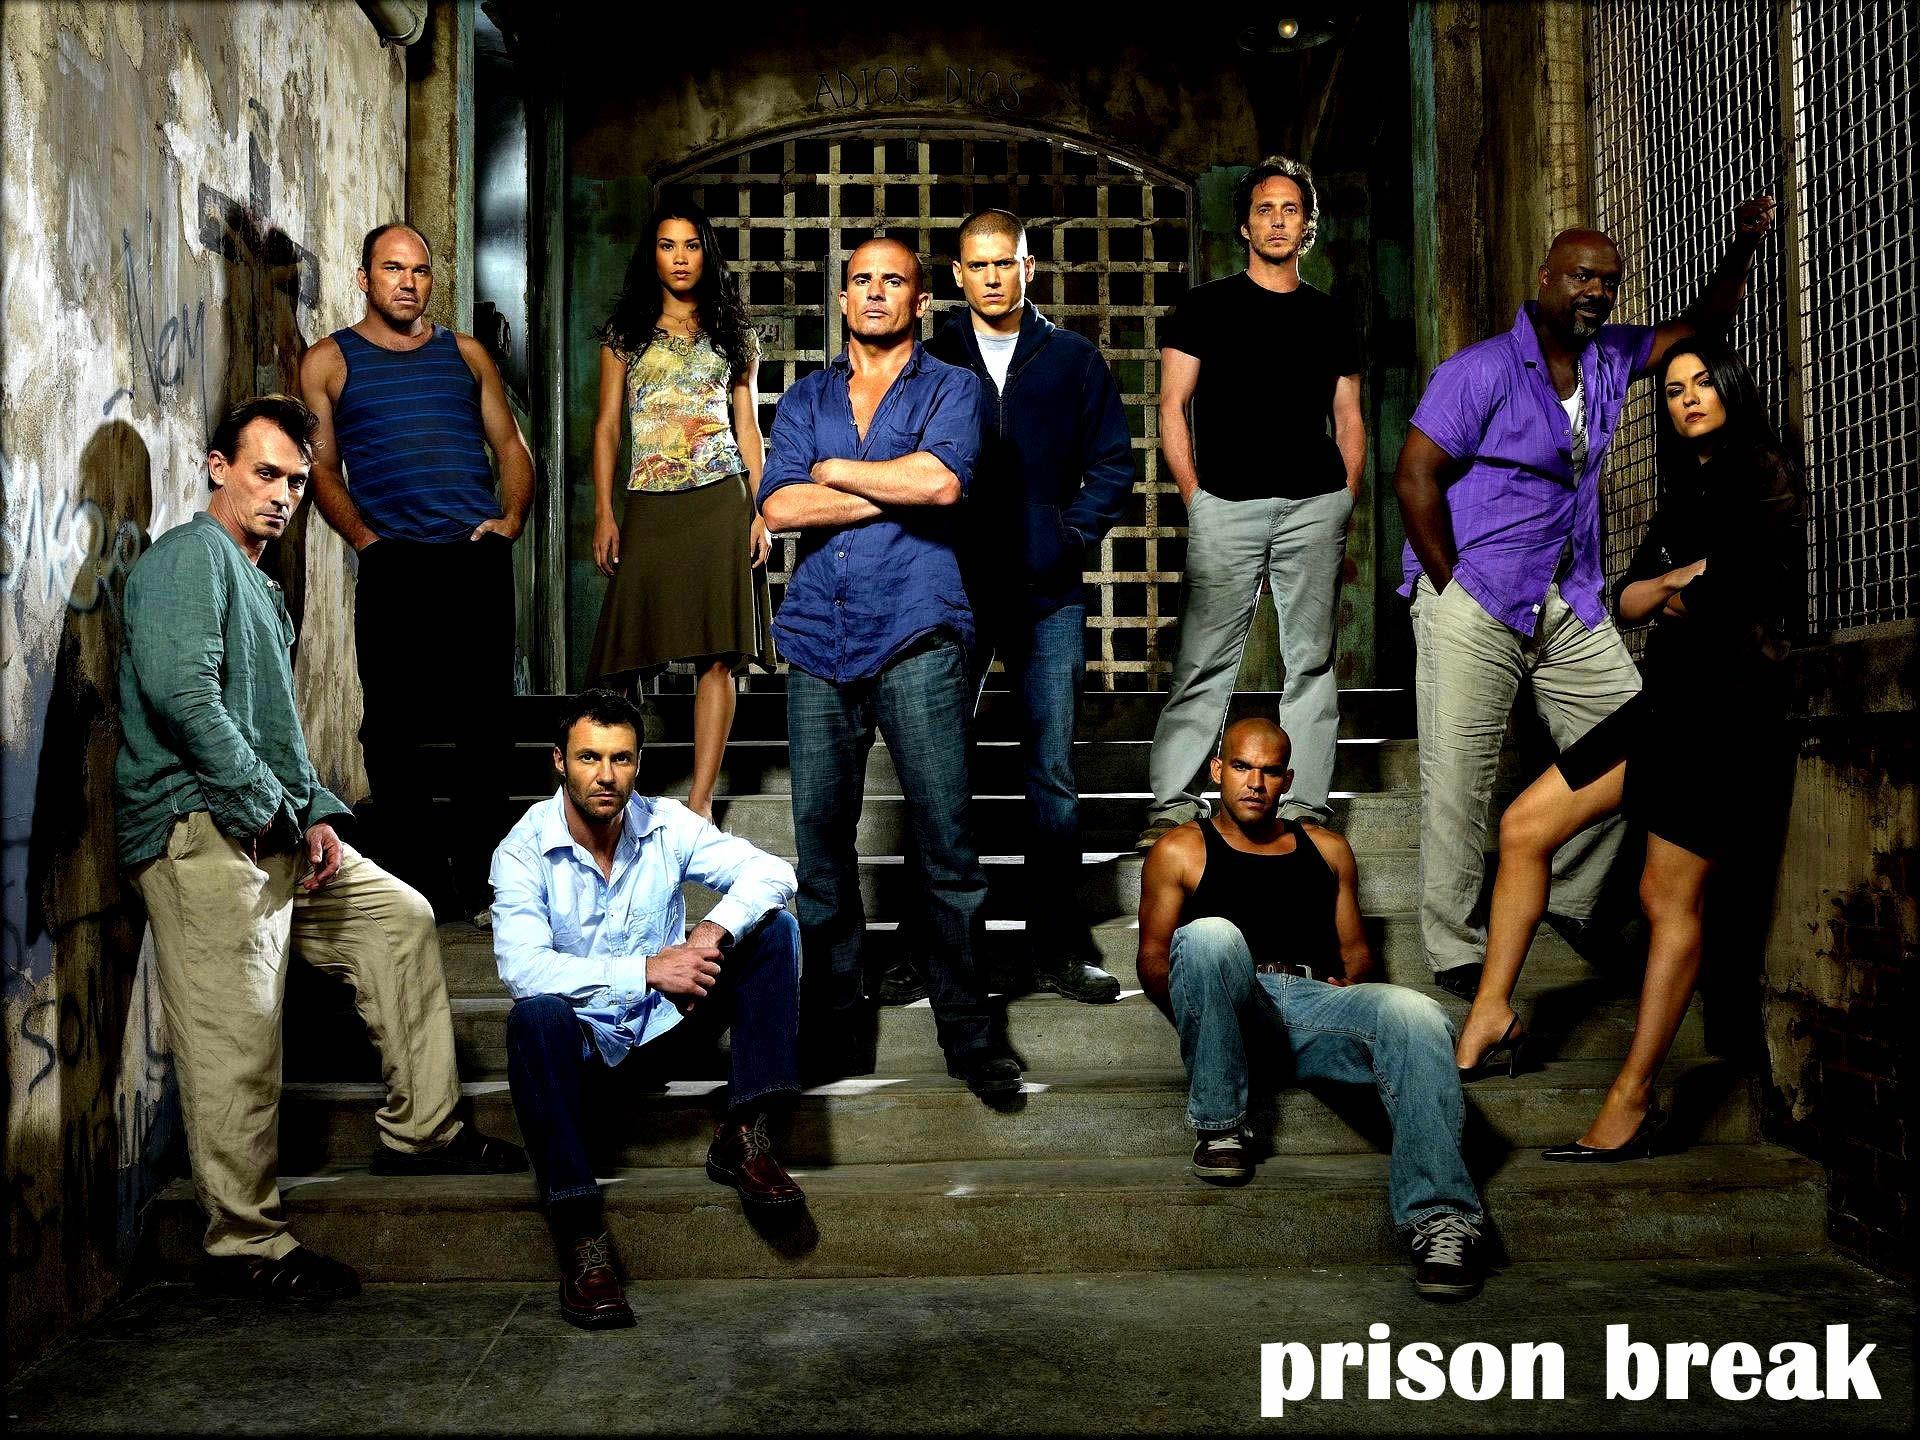 Prison Break Season 4 Wallpapers – Wallpaper Cave